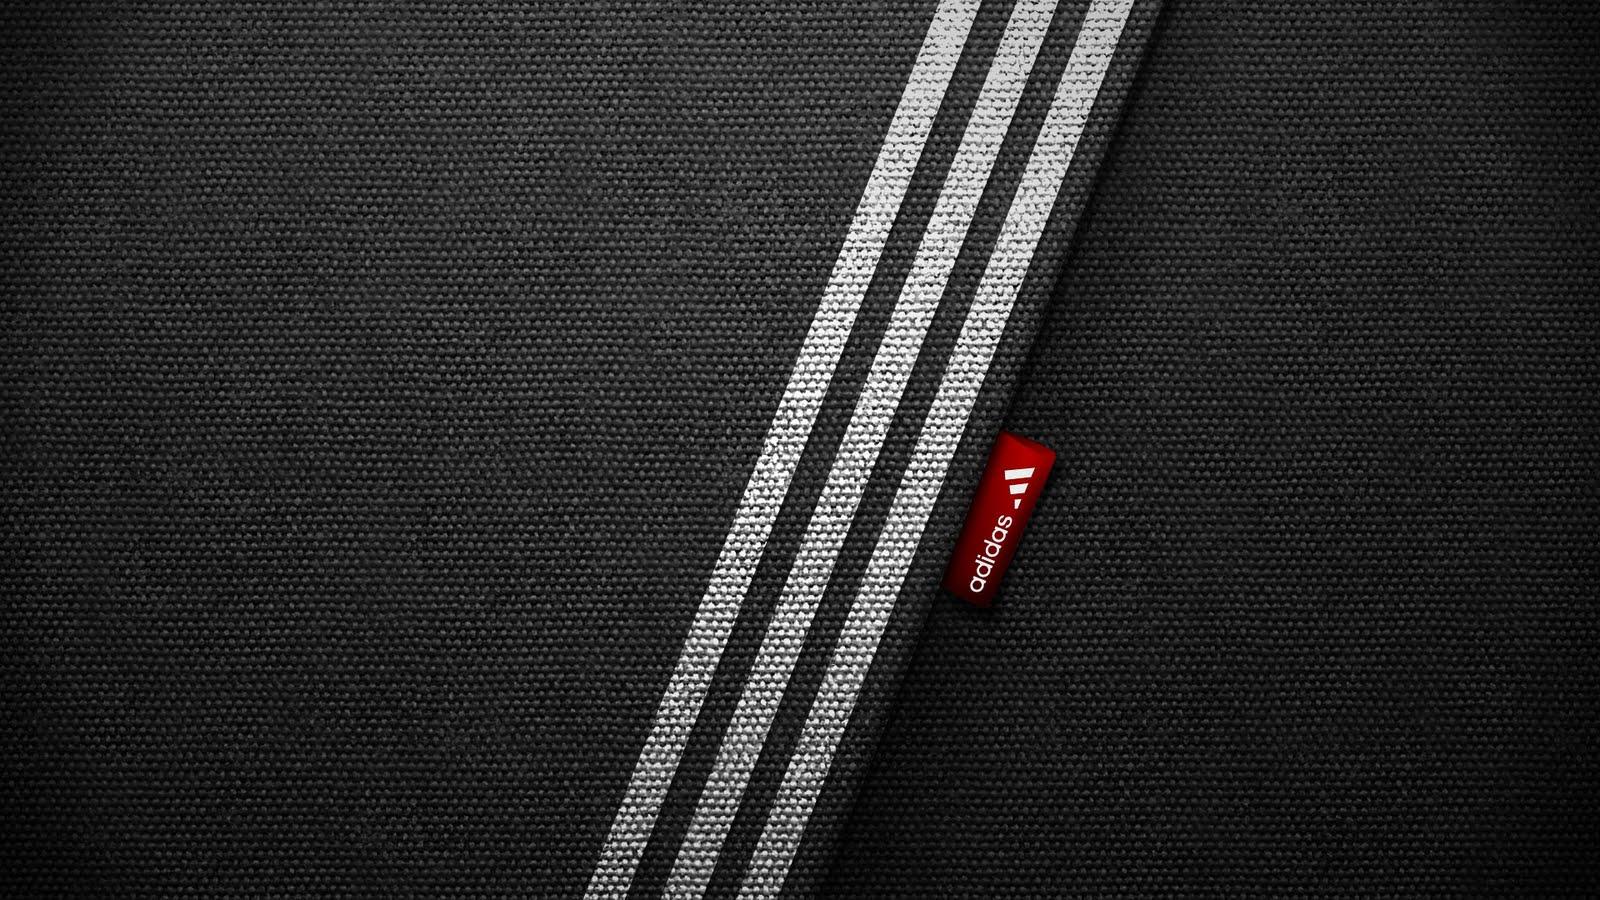 Download Wallpapersfree Hd Wallpaper Adidas